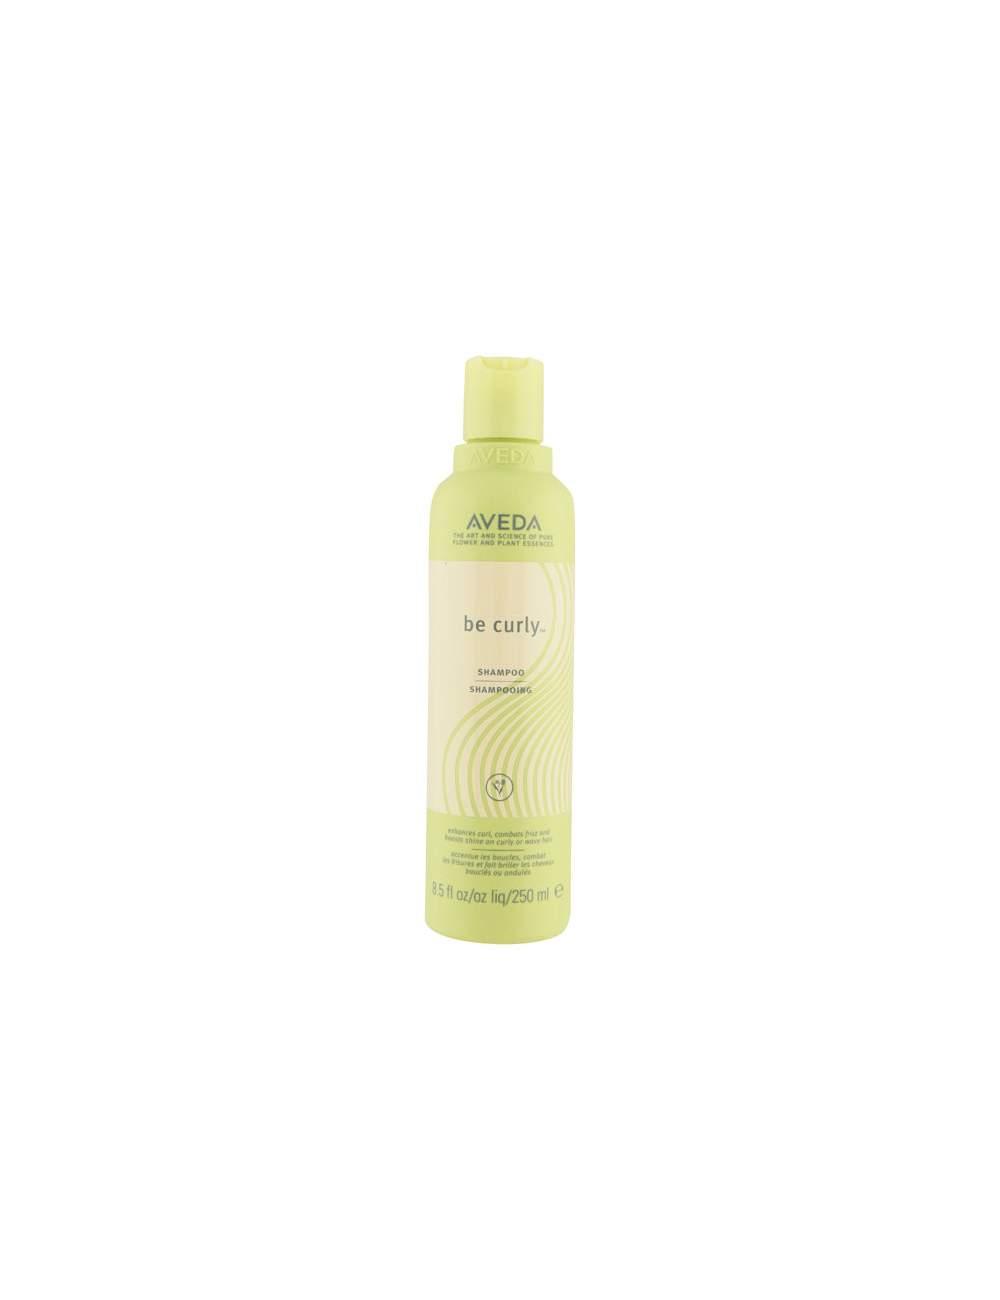 Aveda Be Curly Shampoo 250ml